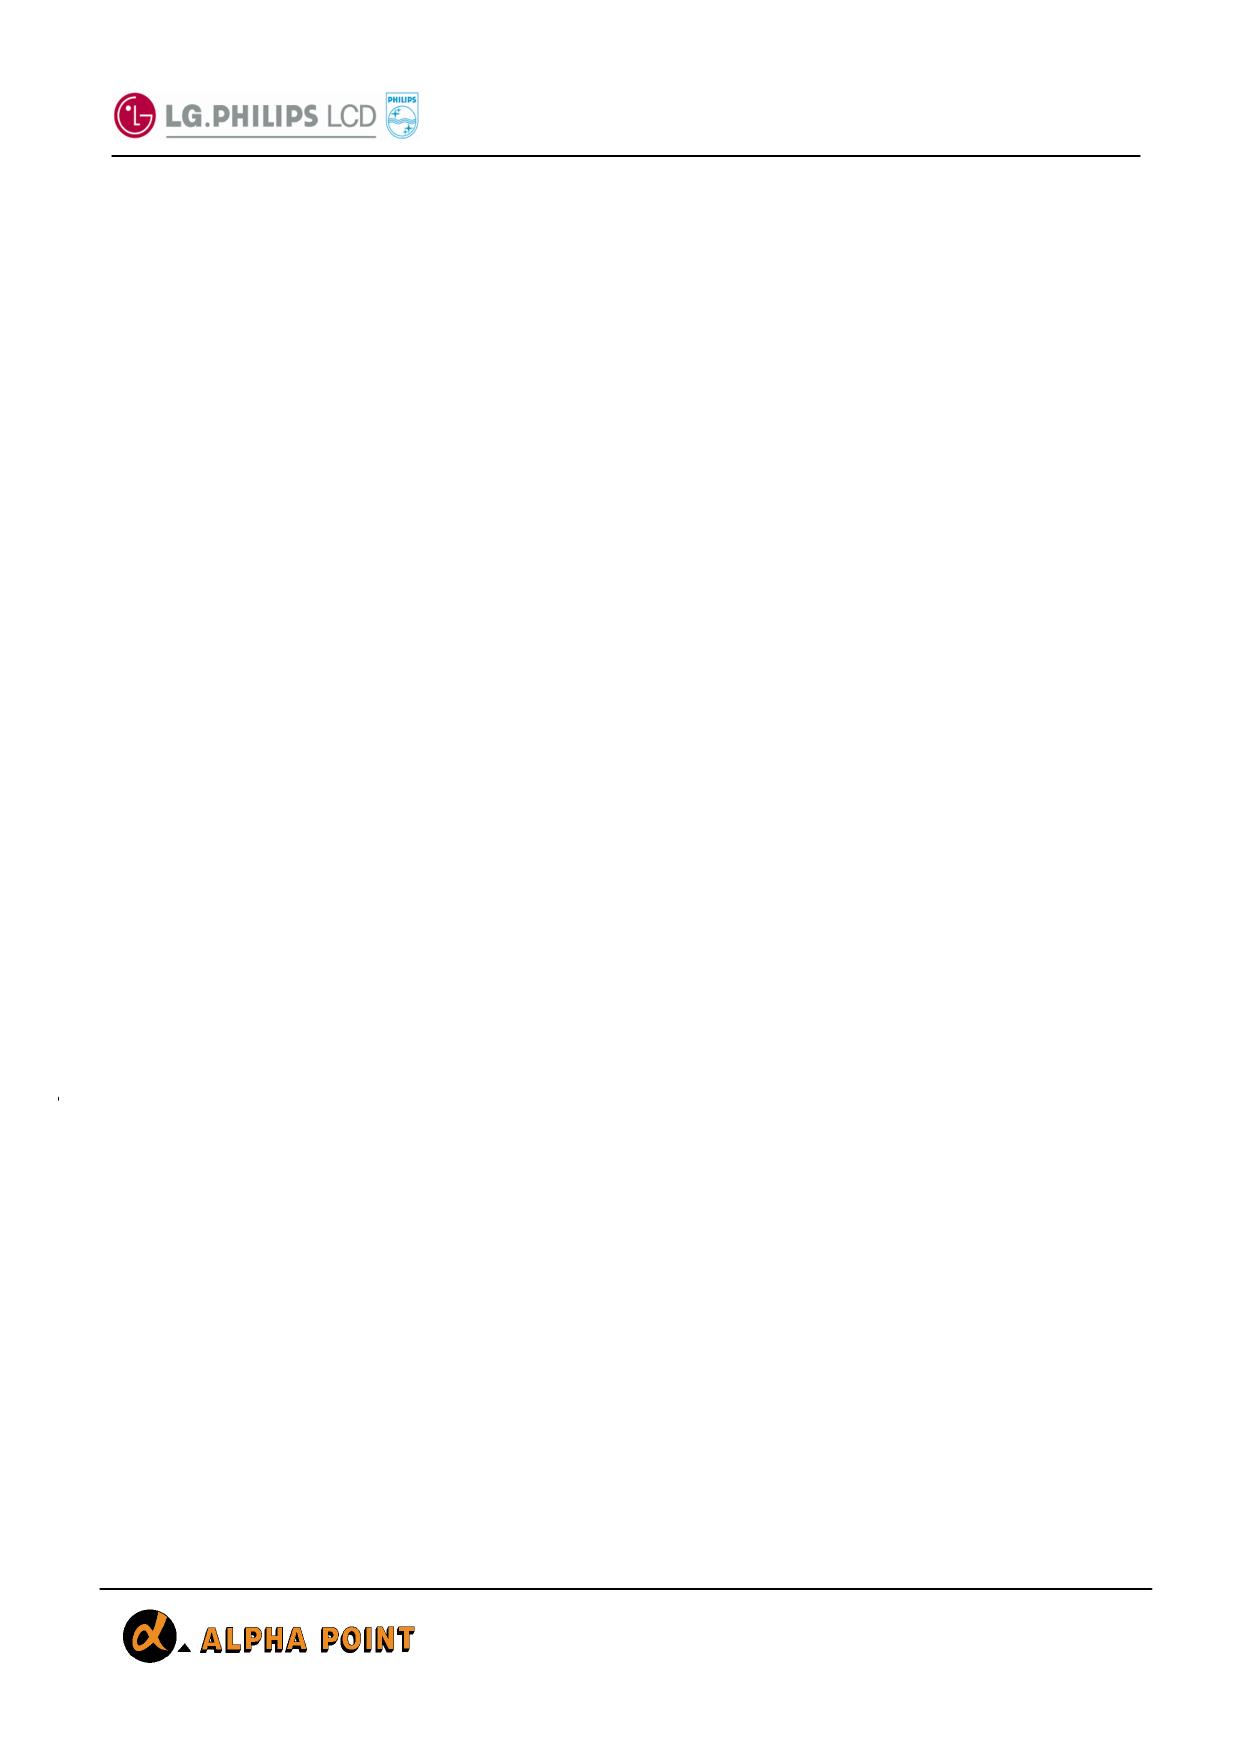 LC104S1-A1 datasheet